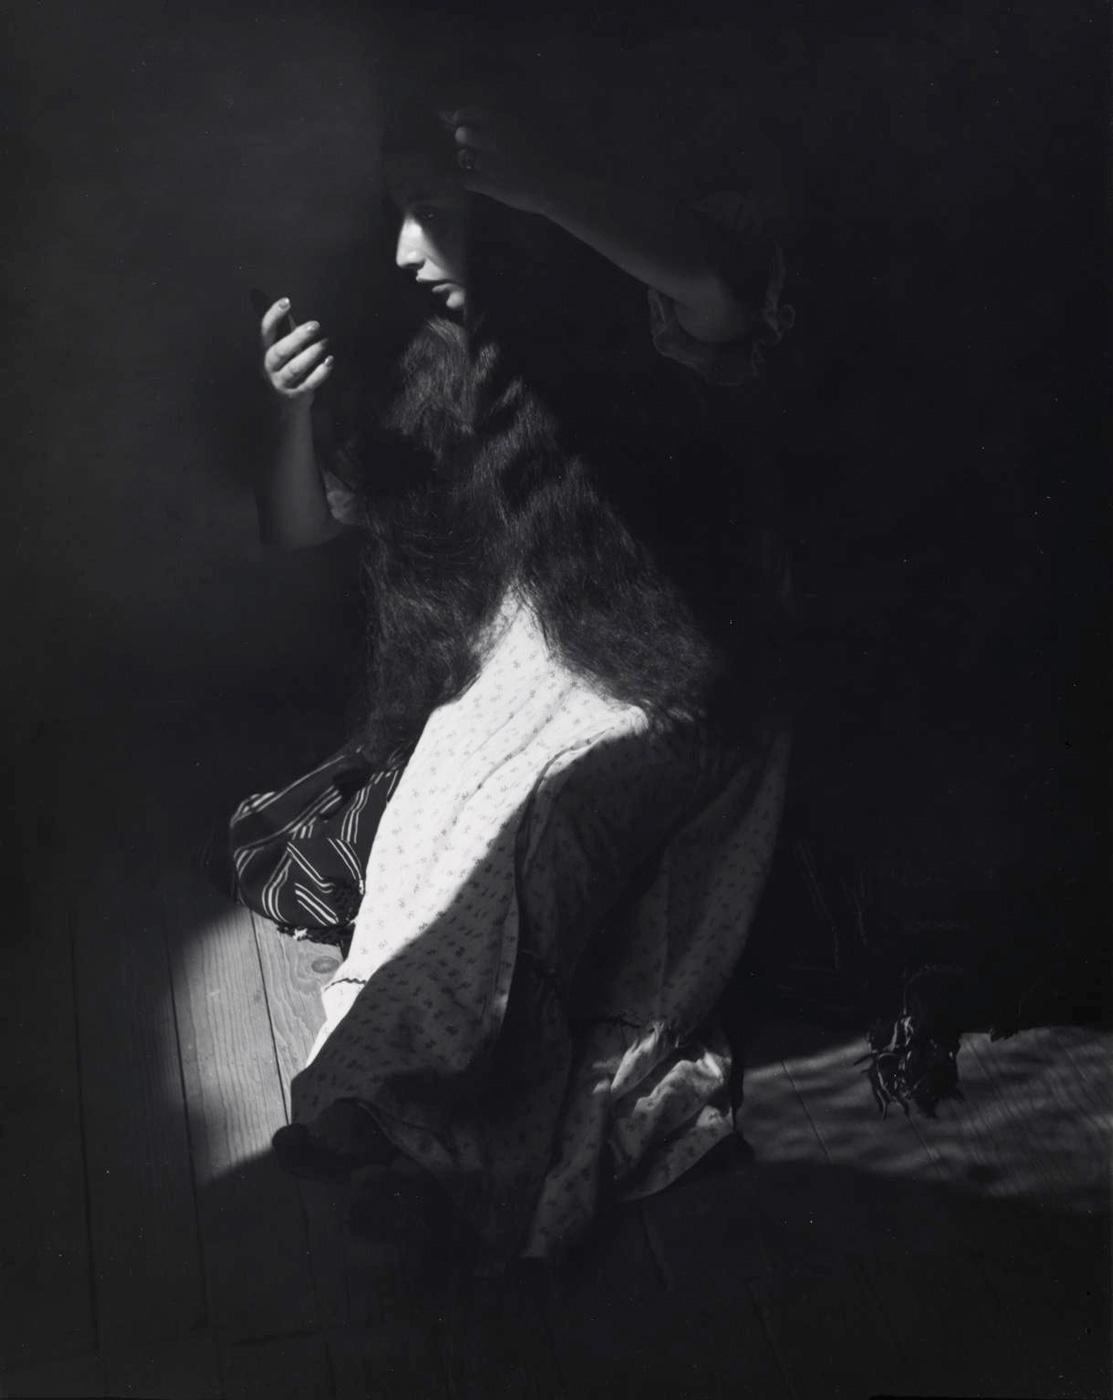 Retrato de lo Eterno/Portrait of the Eternal